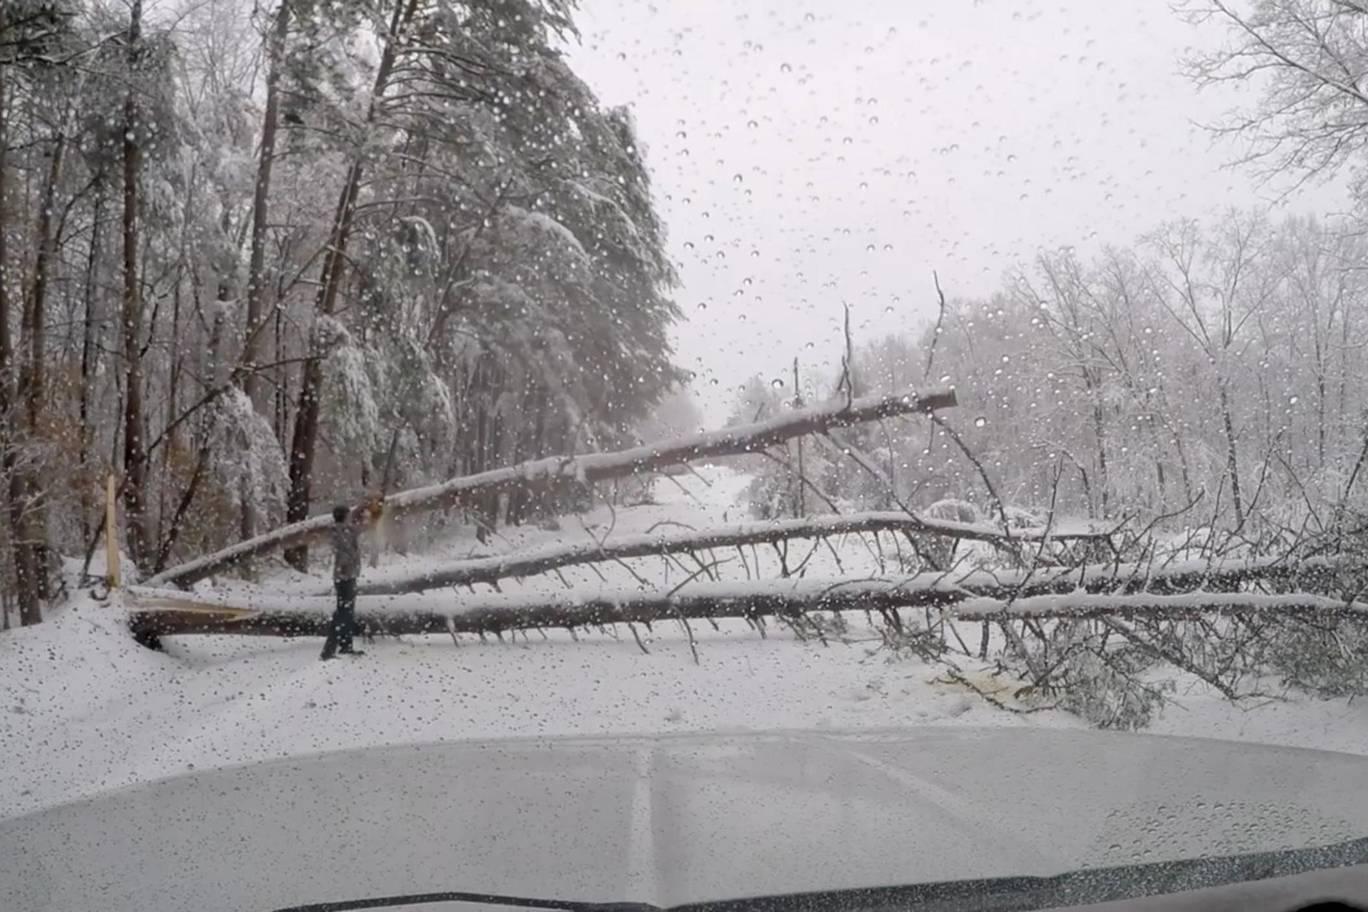 Southeast USA snowstorm